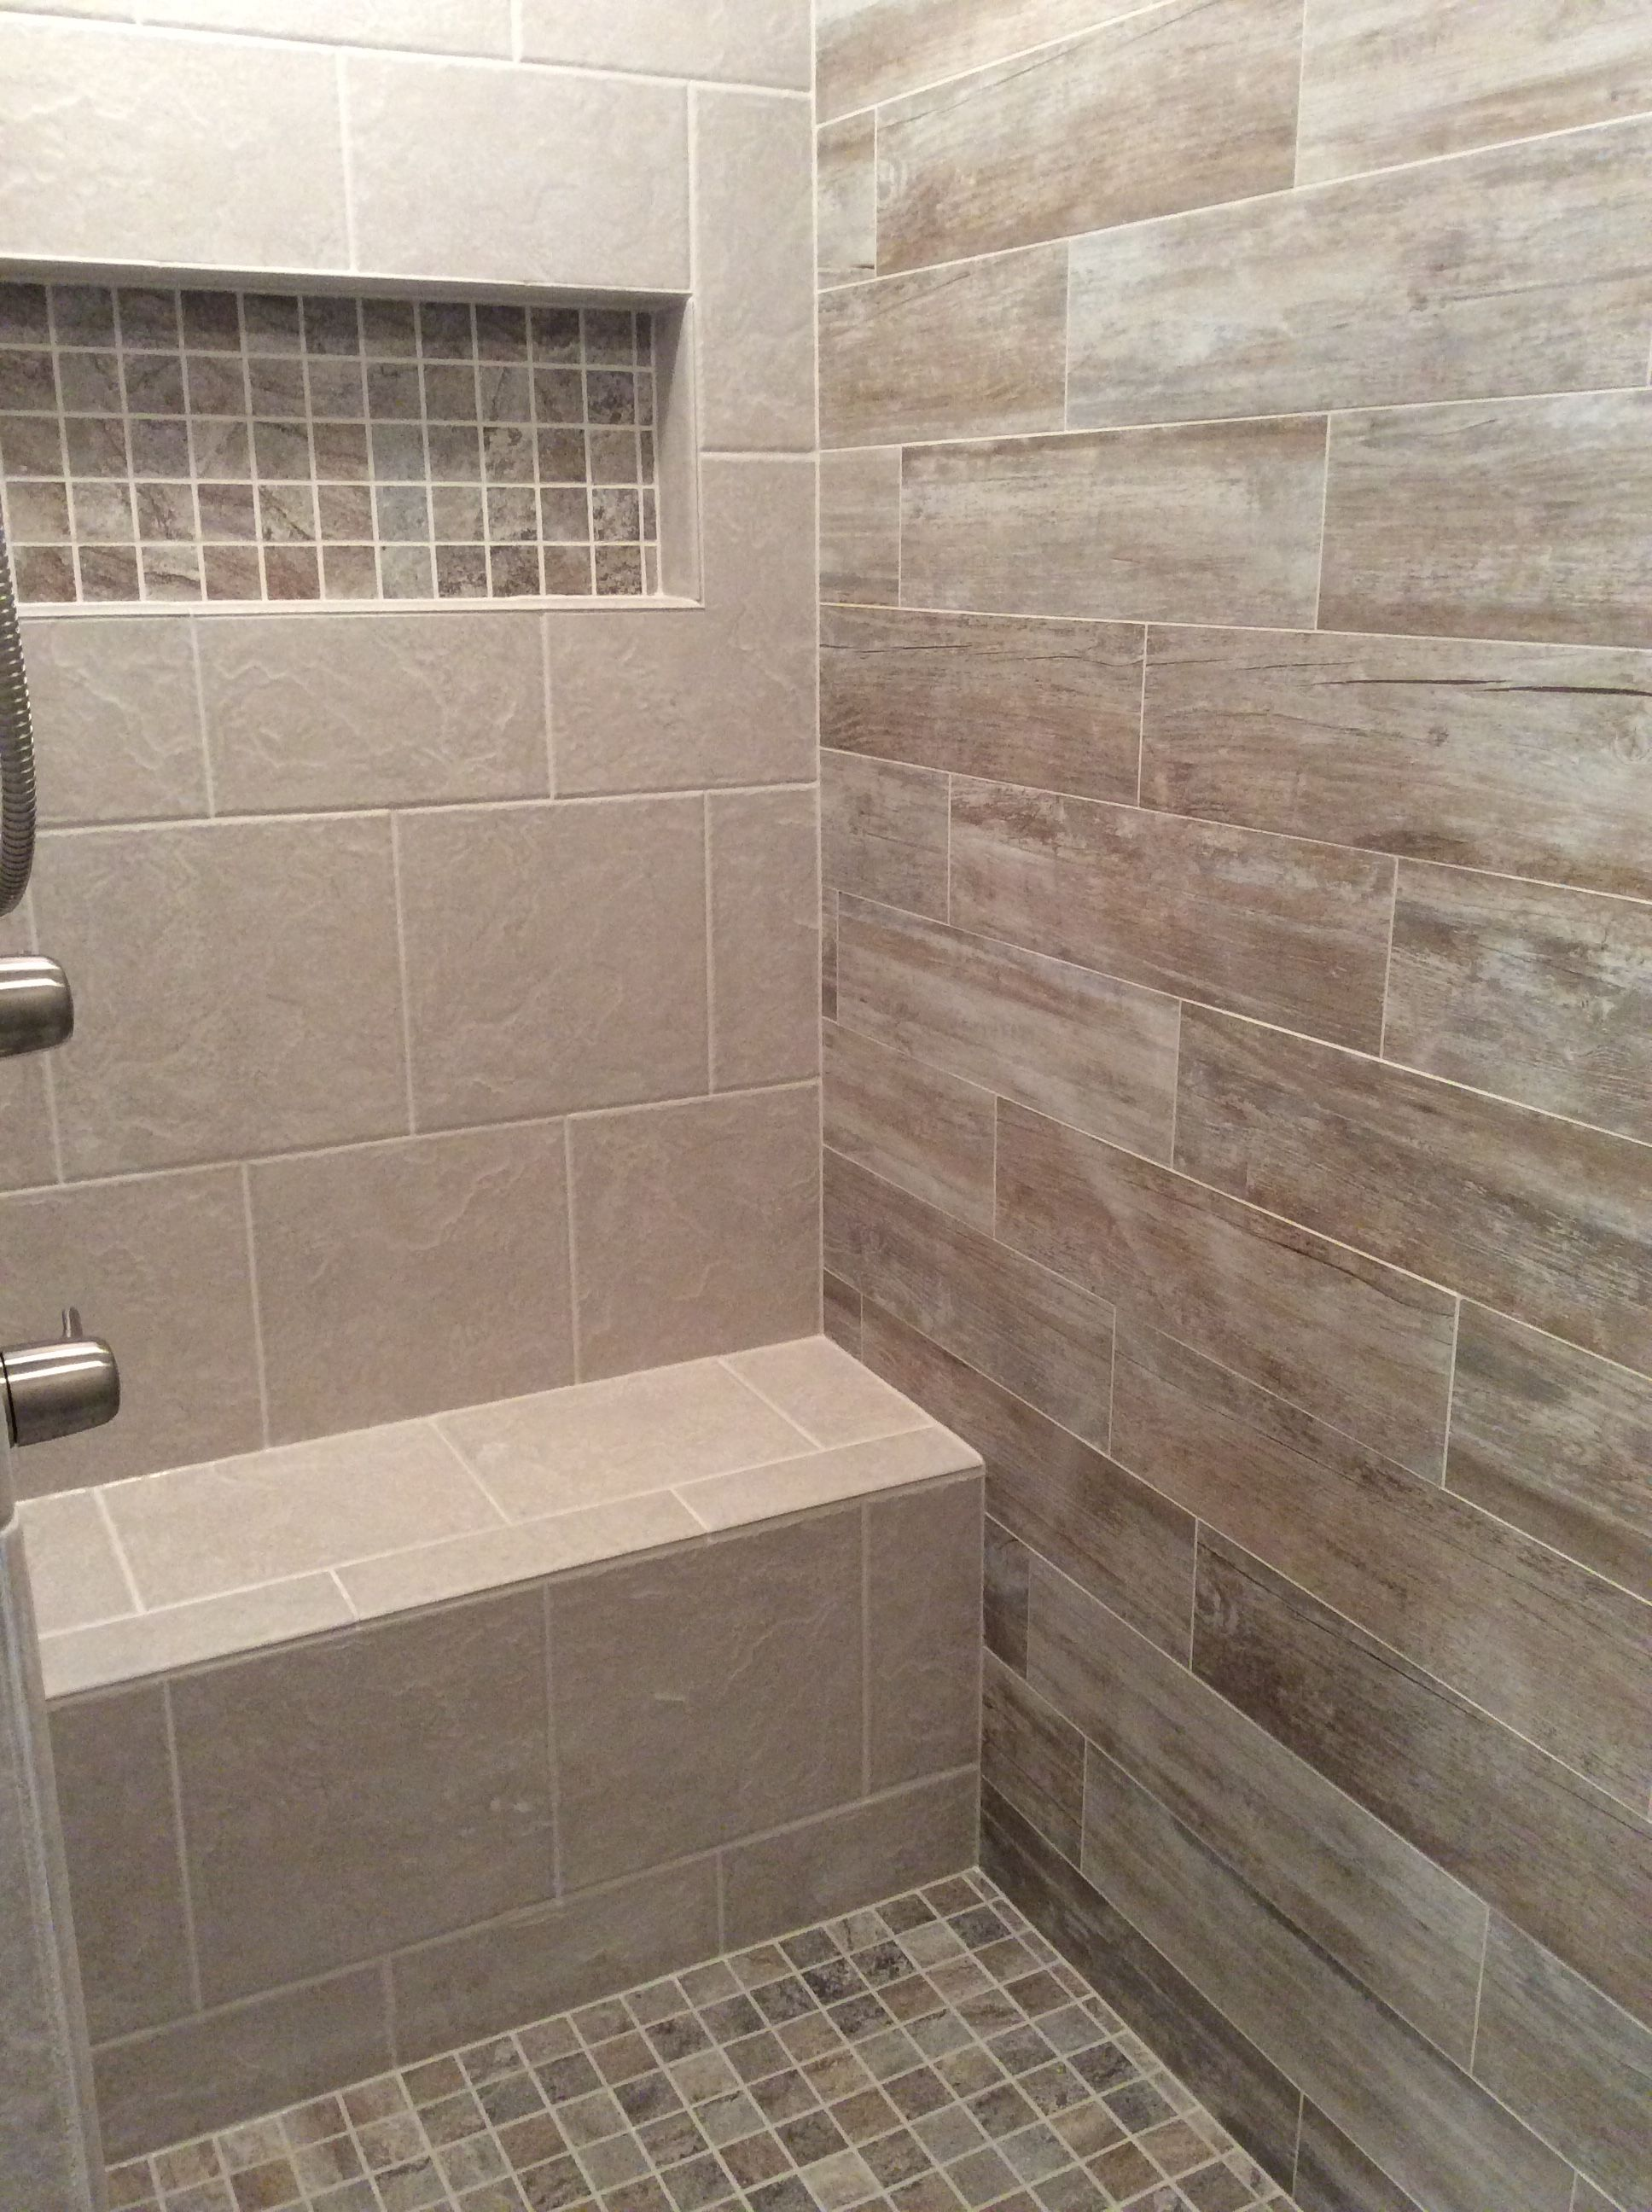 Walk In Shower With Grey And Beige Toned Tiles Beige Bathroom Gray Bathroom Decor Master Bathroom Shower